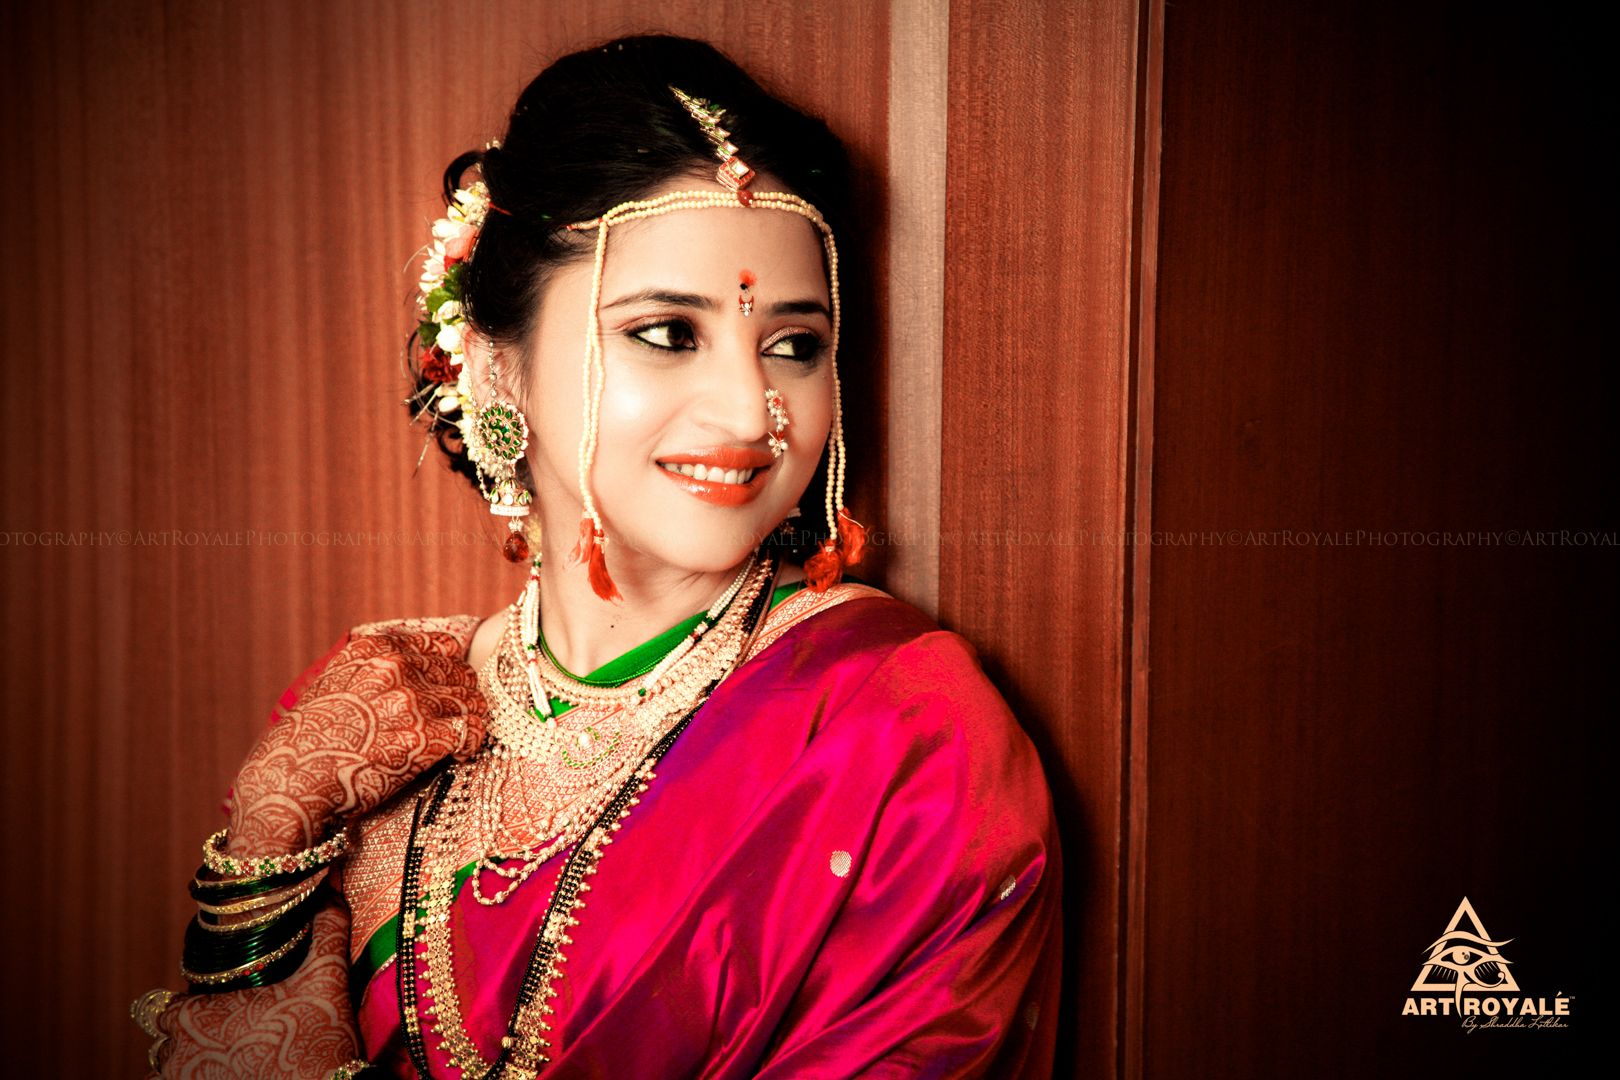 Pin by raj lal on bridalweddings pinterest candid wedding and